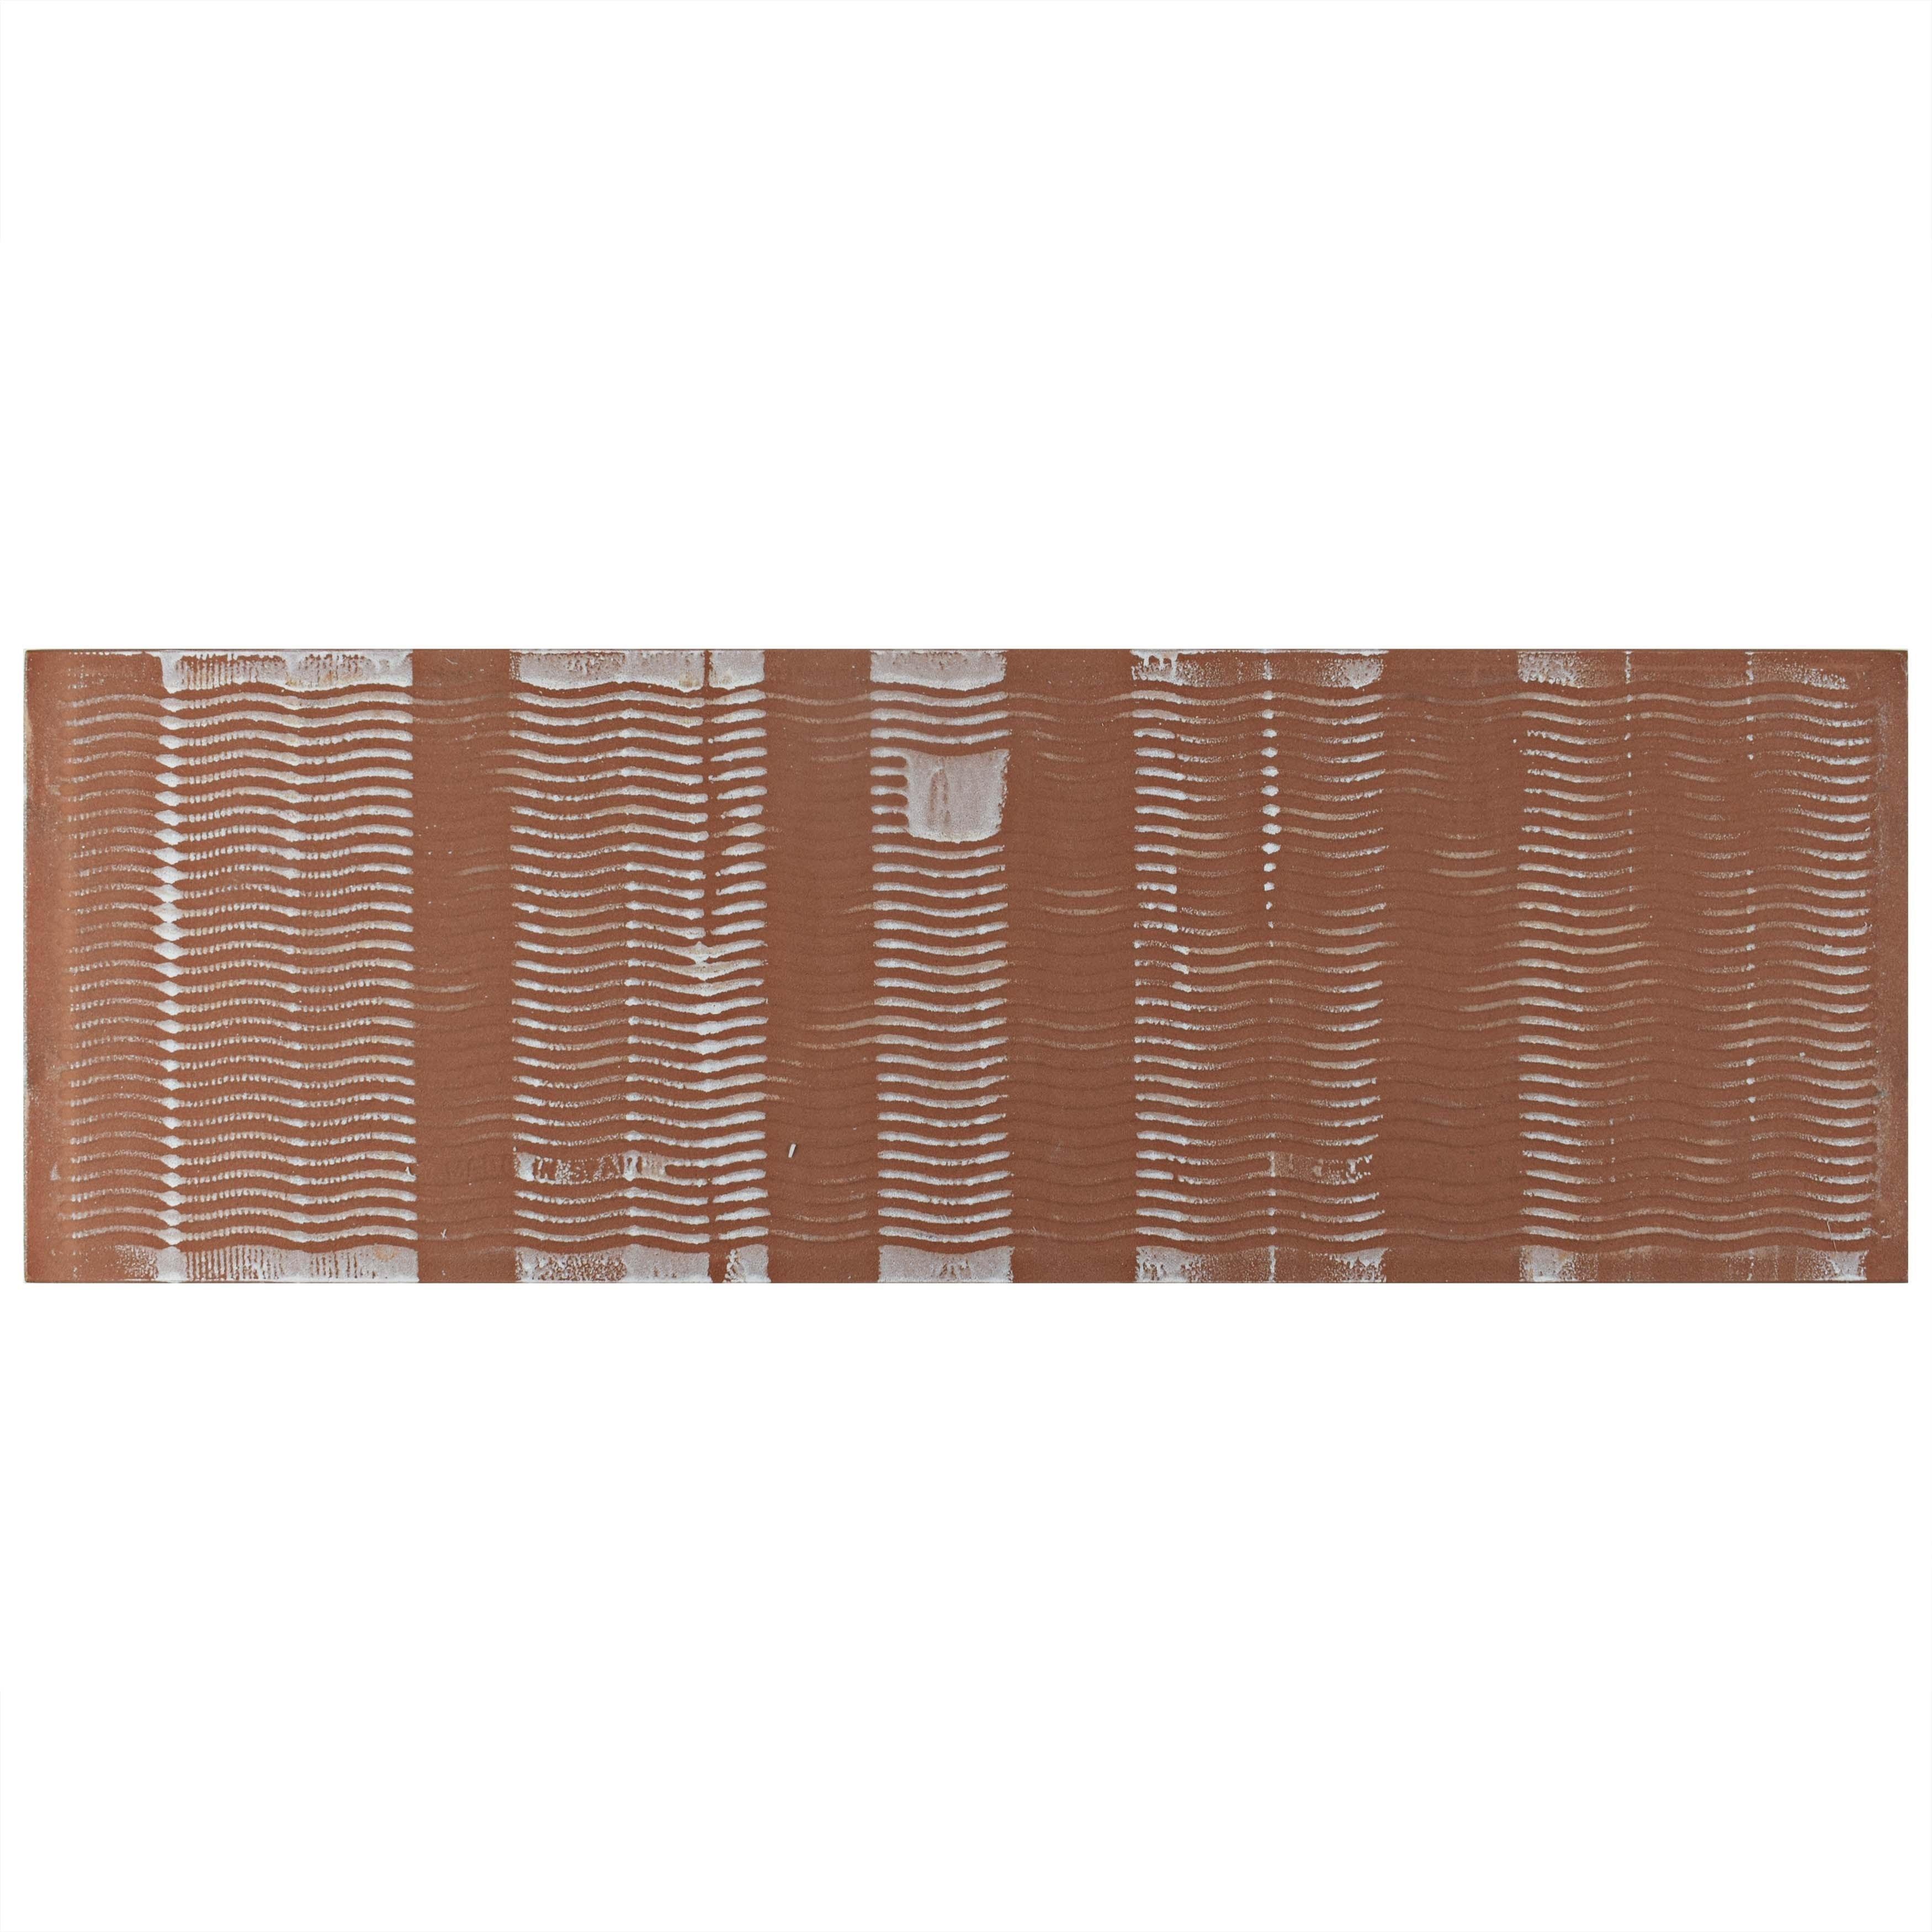 Shop SomerTile 8x24-inch Belize Perla Ceramic Wall Tile (9 tiles ...